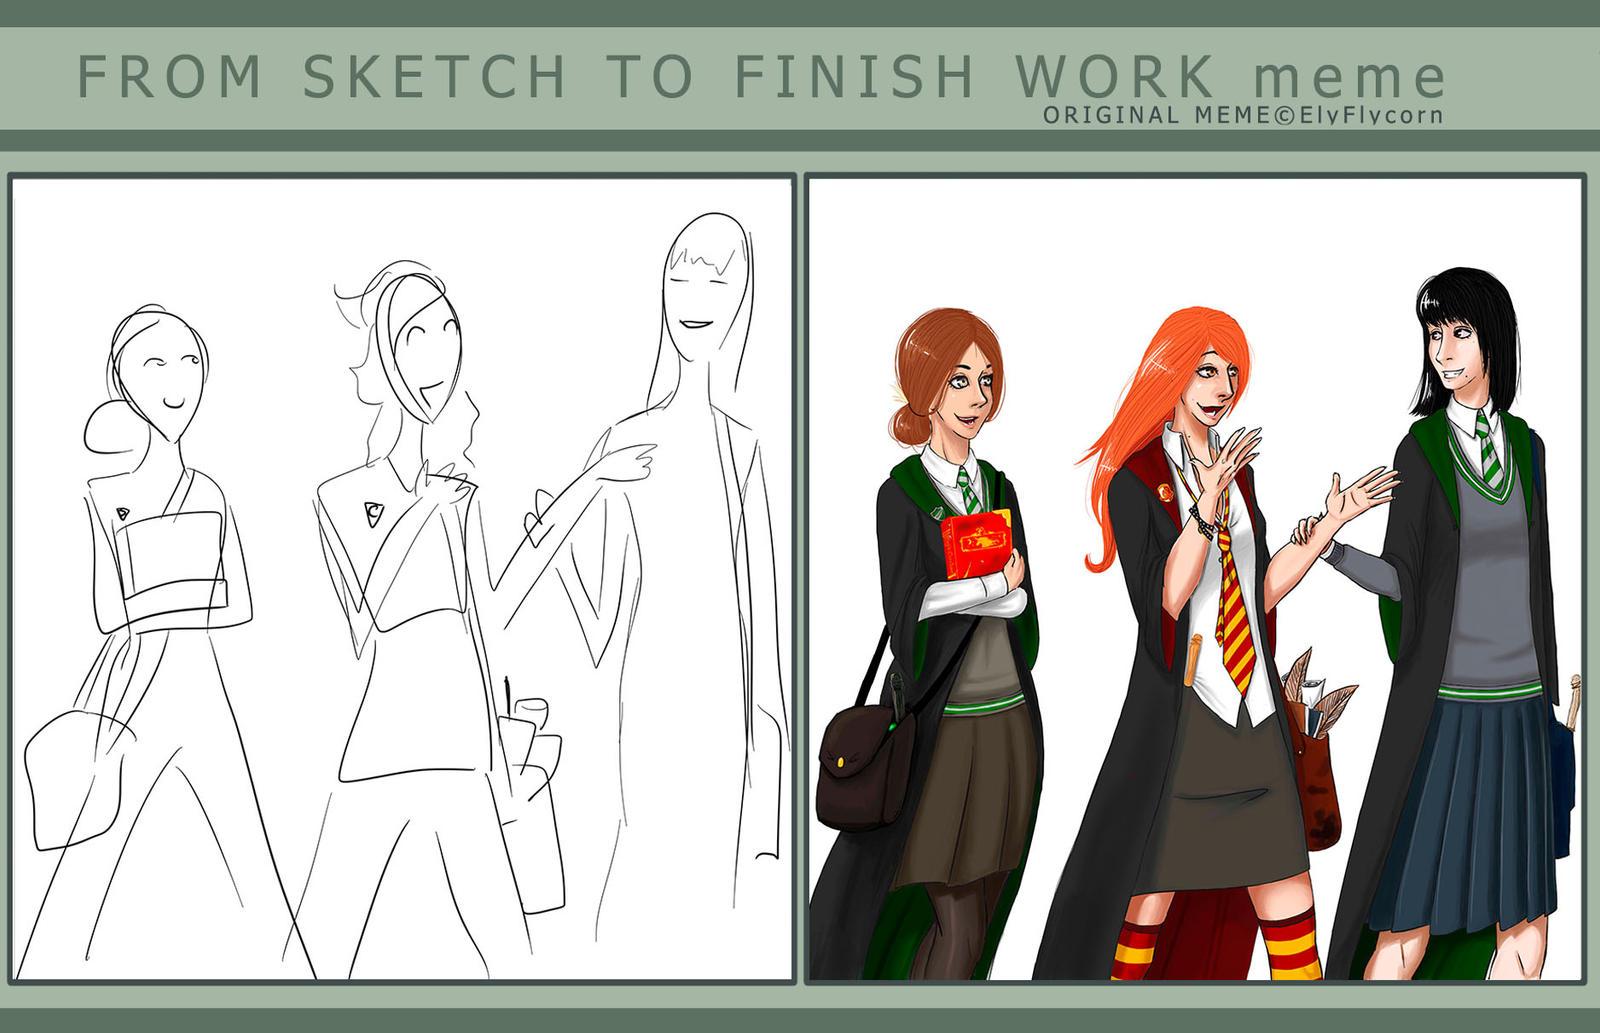 Funny Cartoon Office Meme : Hogwarts company sketch to finish work meme by elgrell on deviantart